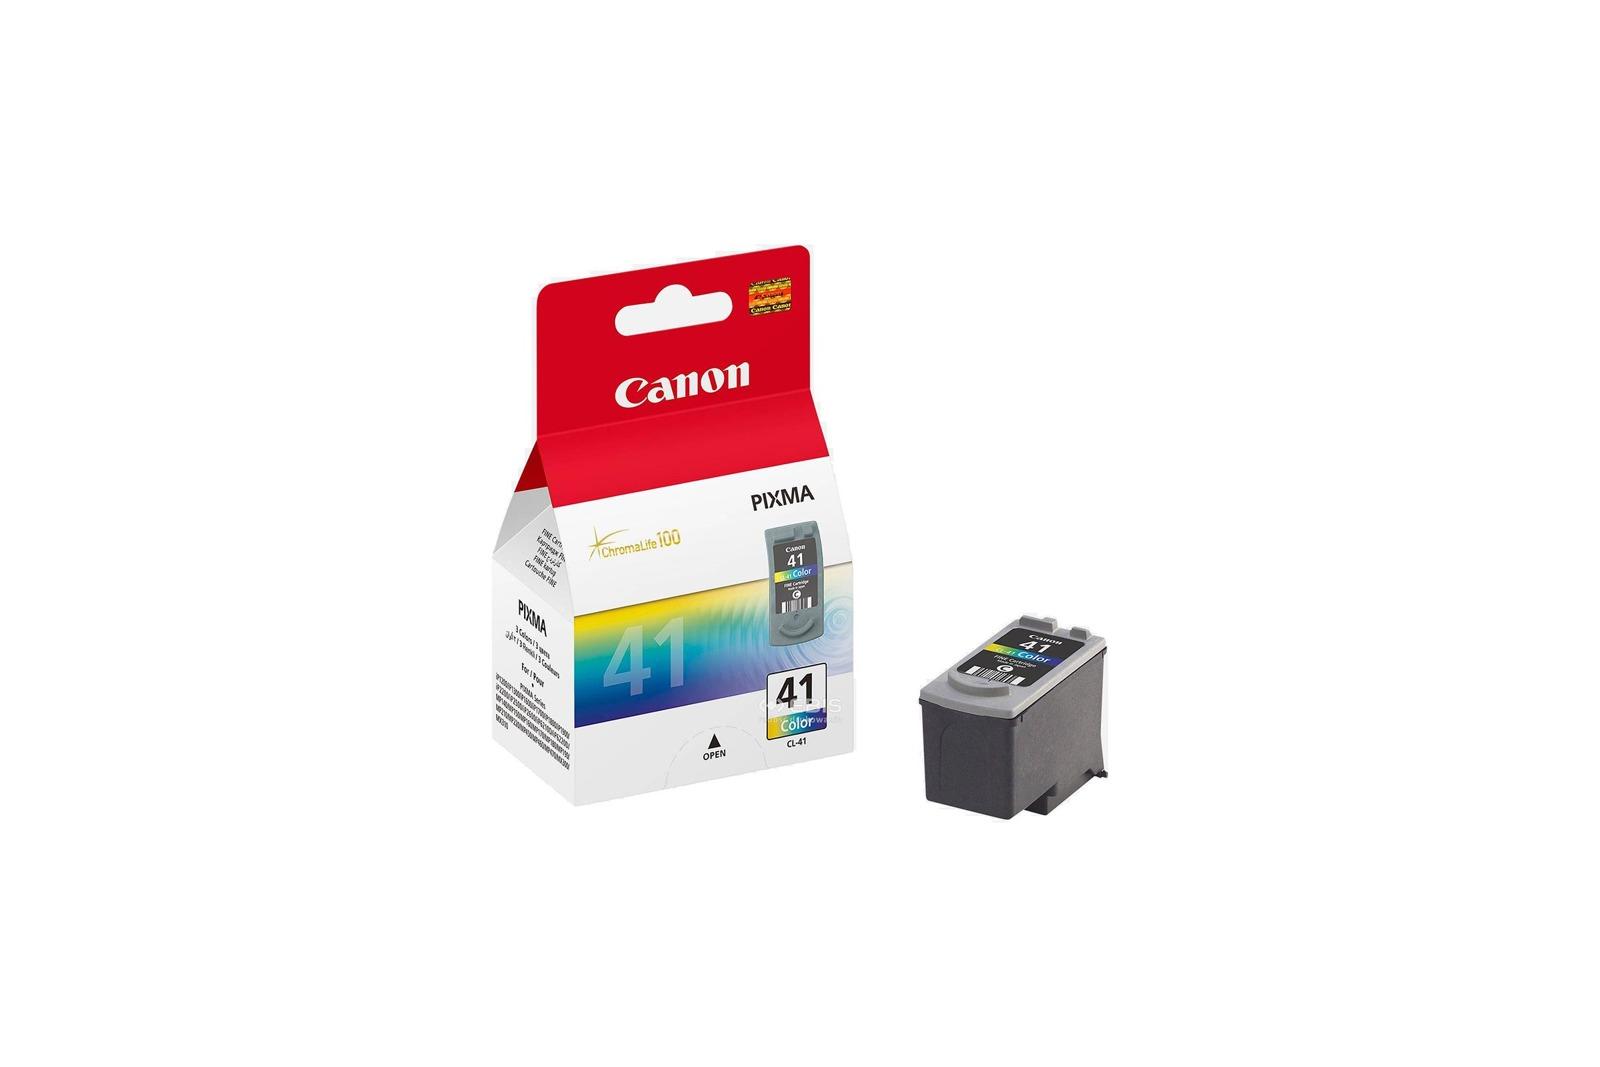 Genuine Ink Cartridge Canon 41 0617B001 Tri-color